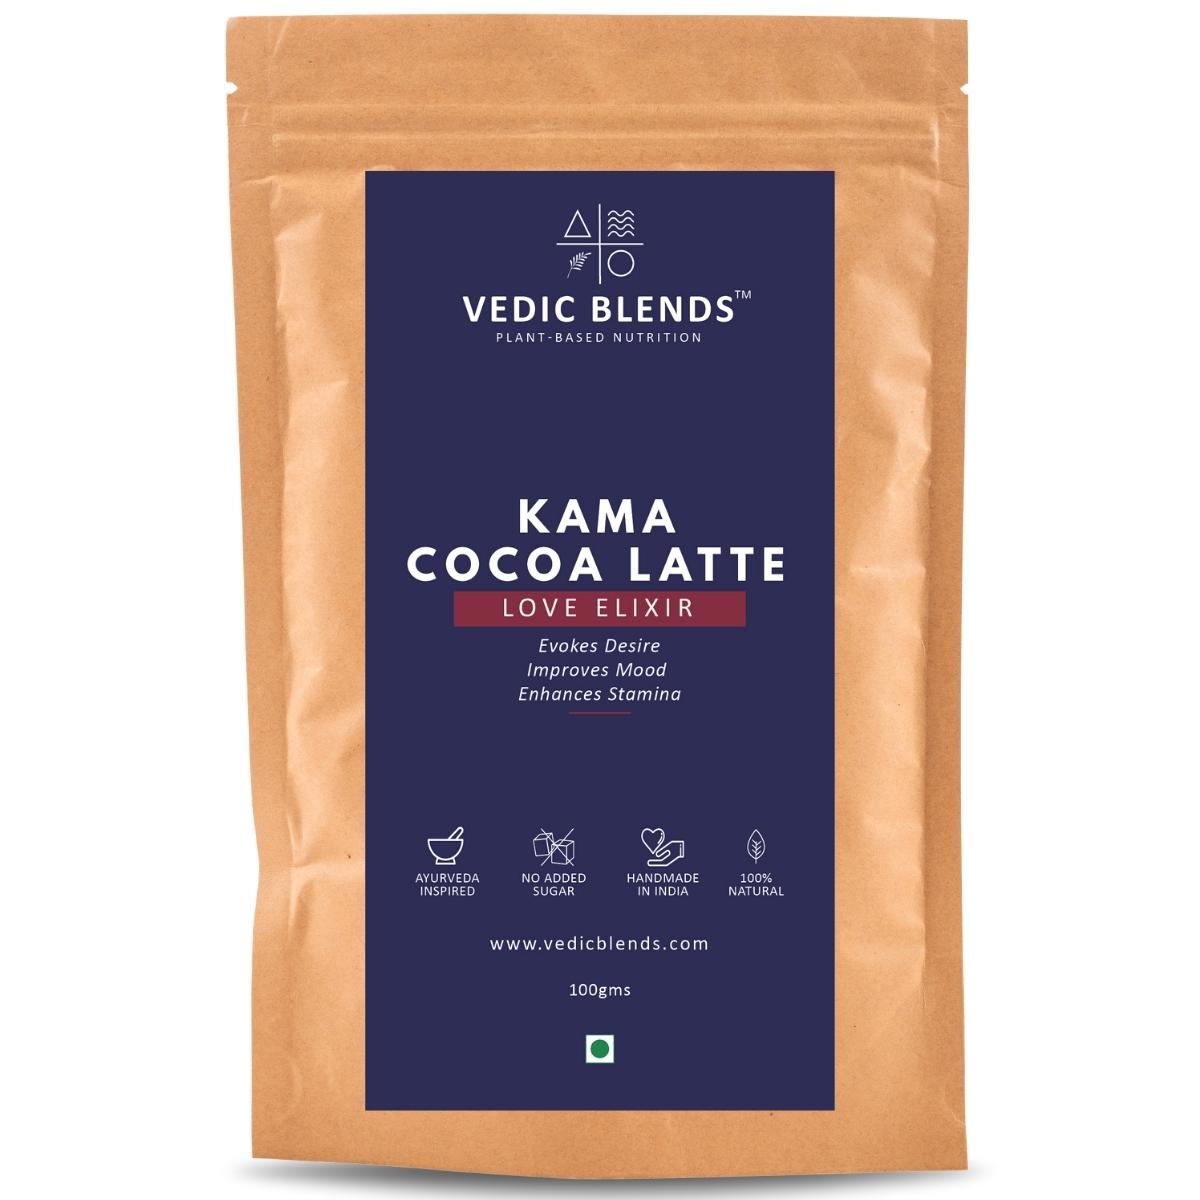 Kama Coca Latte by Vedic Blends | Desire, Mood, Stamina | 200g, 20 cups